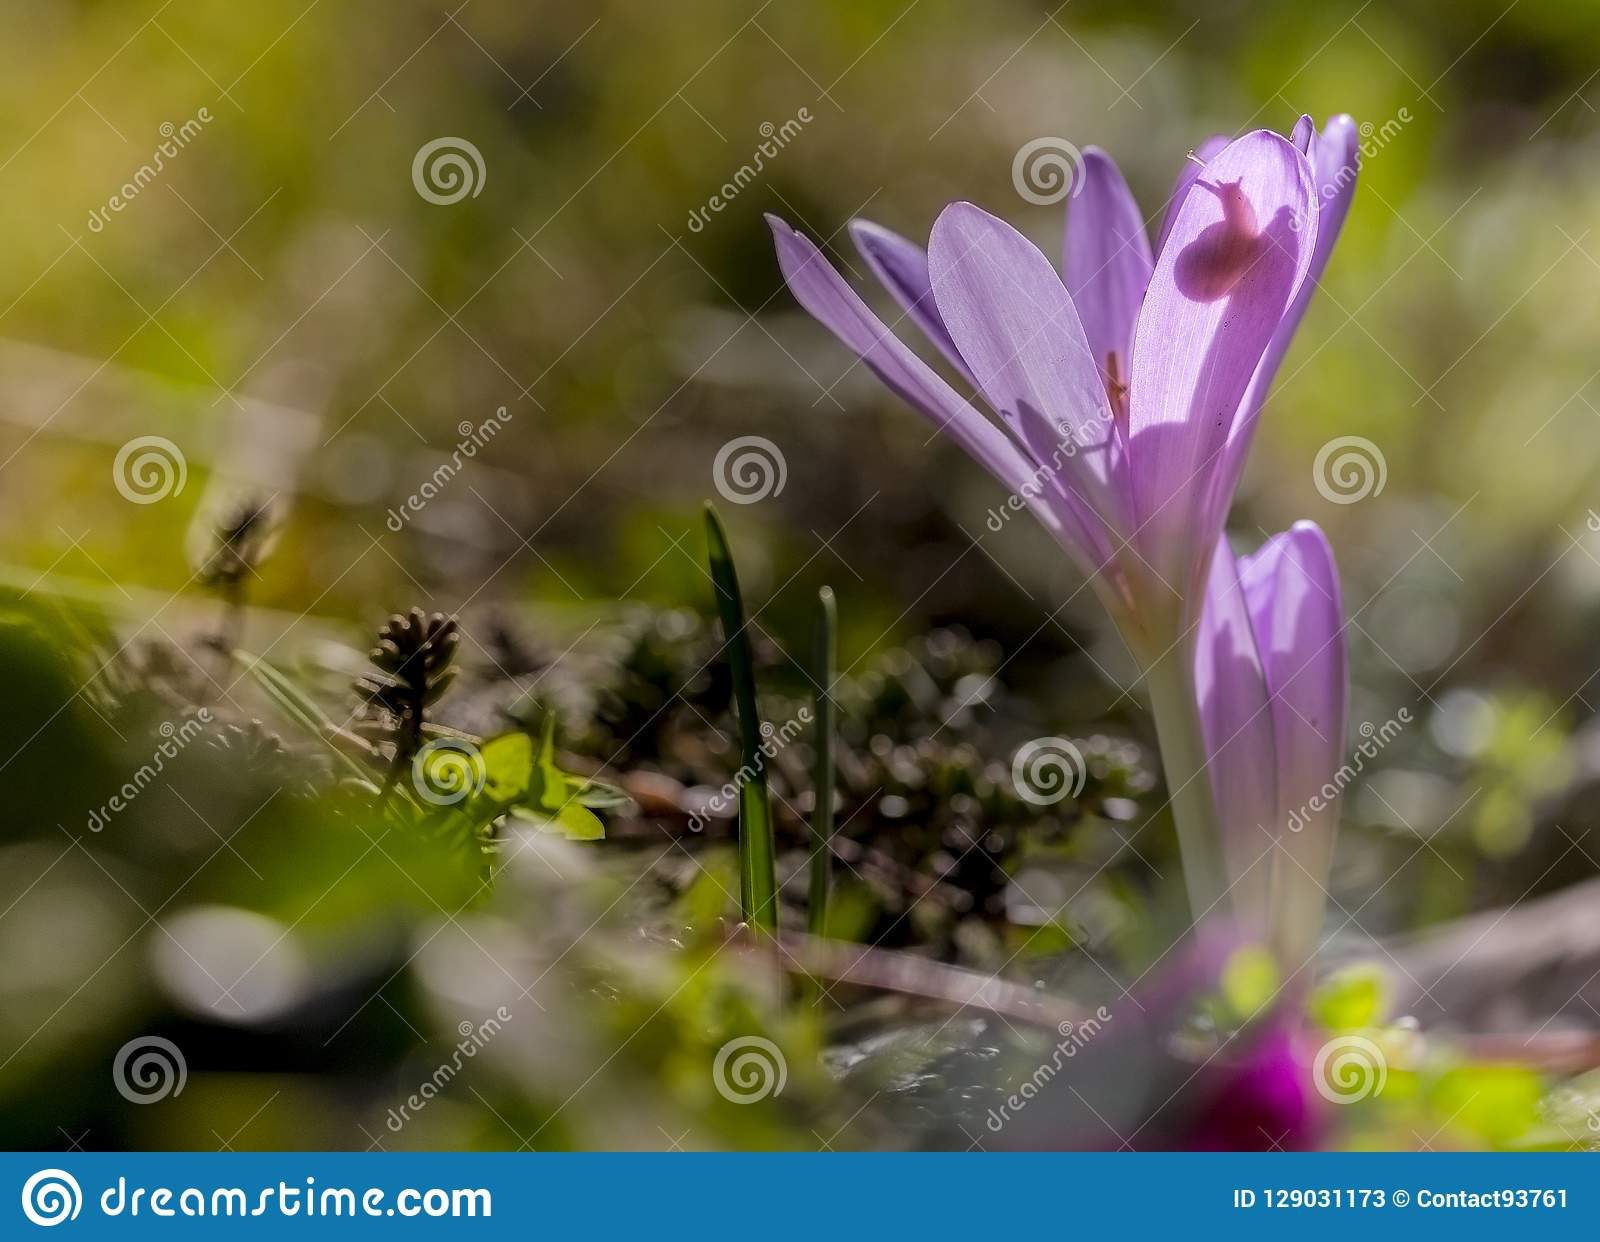 Herfsttijloos, шафран луга, autumnale безвременника